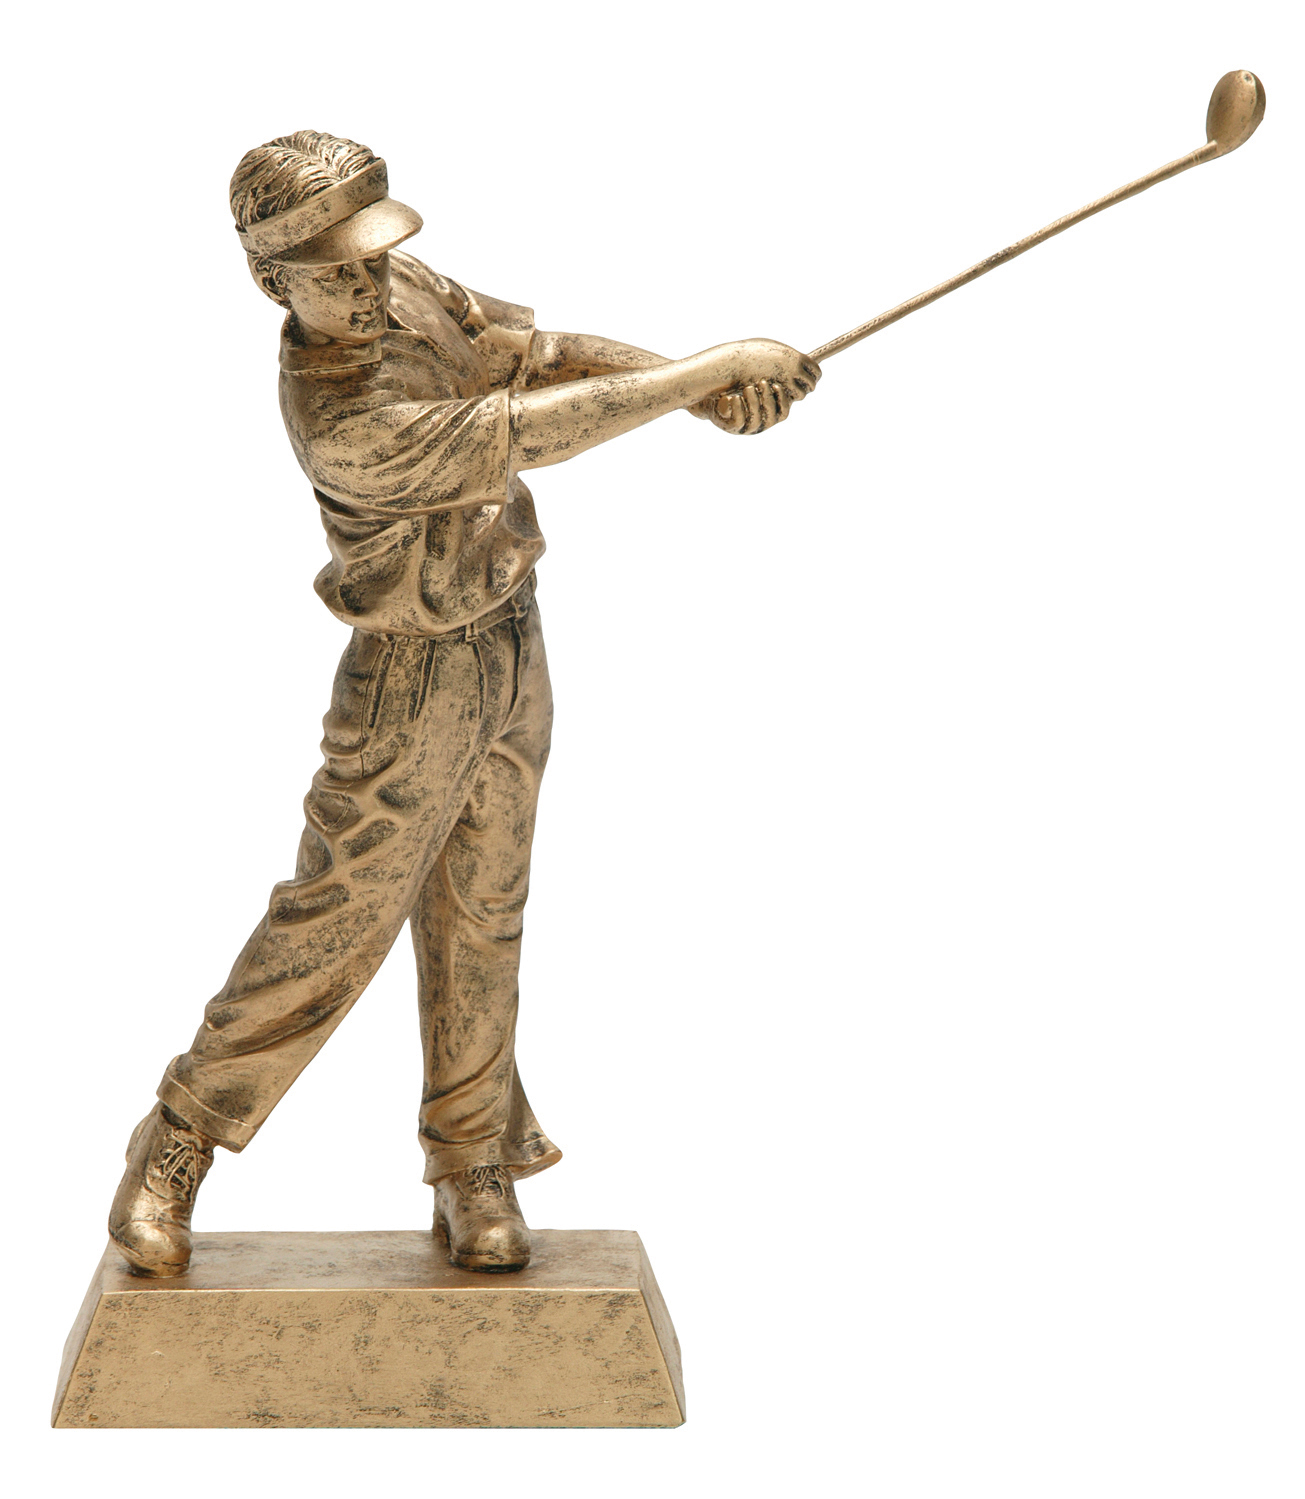 "Golf, Male:   Large - 50624-G - 10.5""  Medium - 50621-G - 8"""